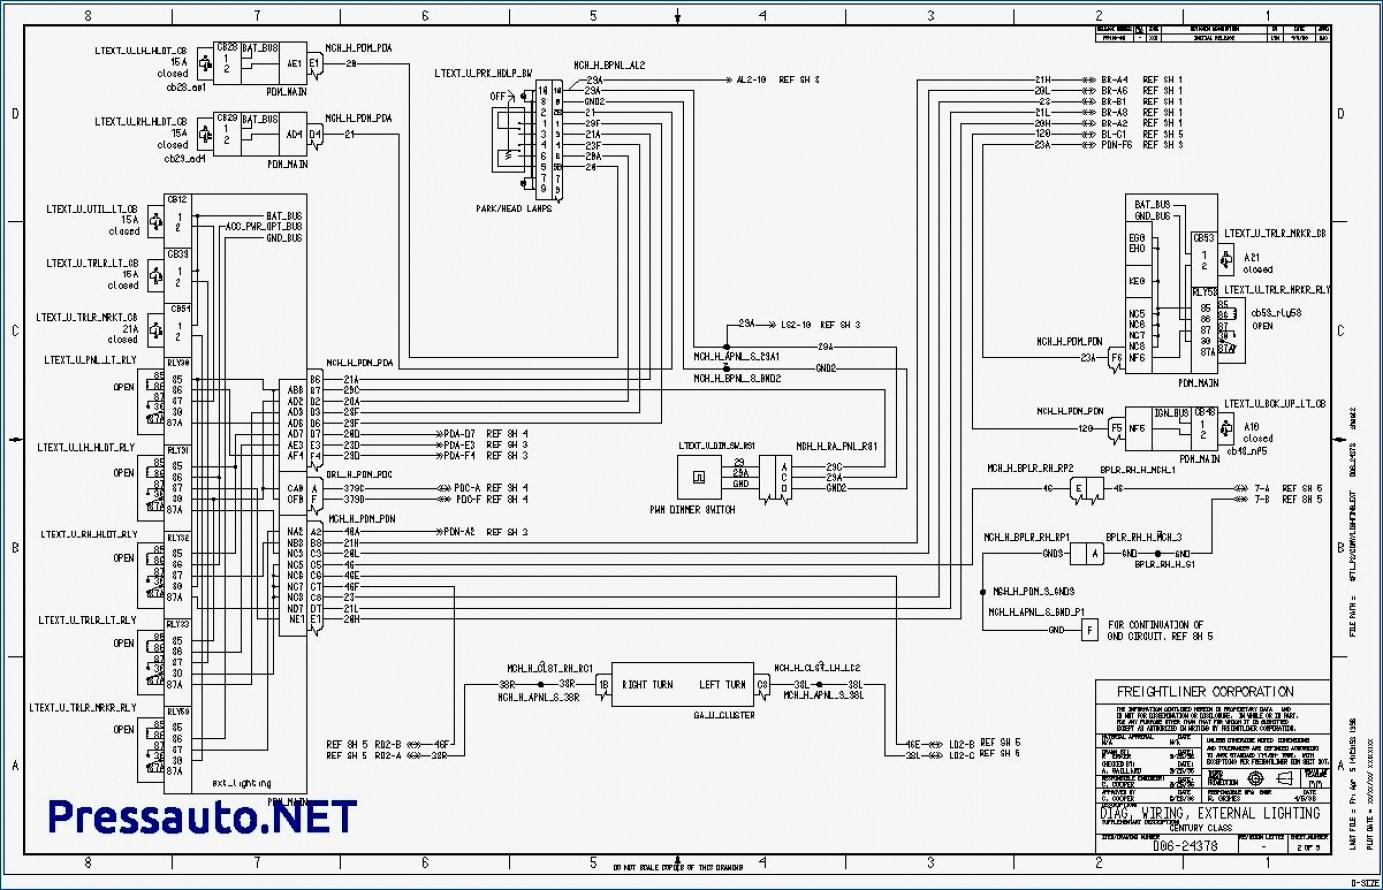 1990 Freightliner Wiring Diagram - Diagram Design Sources layout-white -  layout-white.nius-icbosa.itdiagram database - nius-icbosa.it